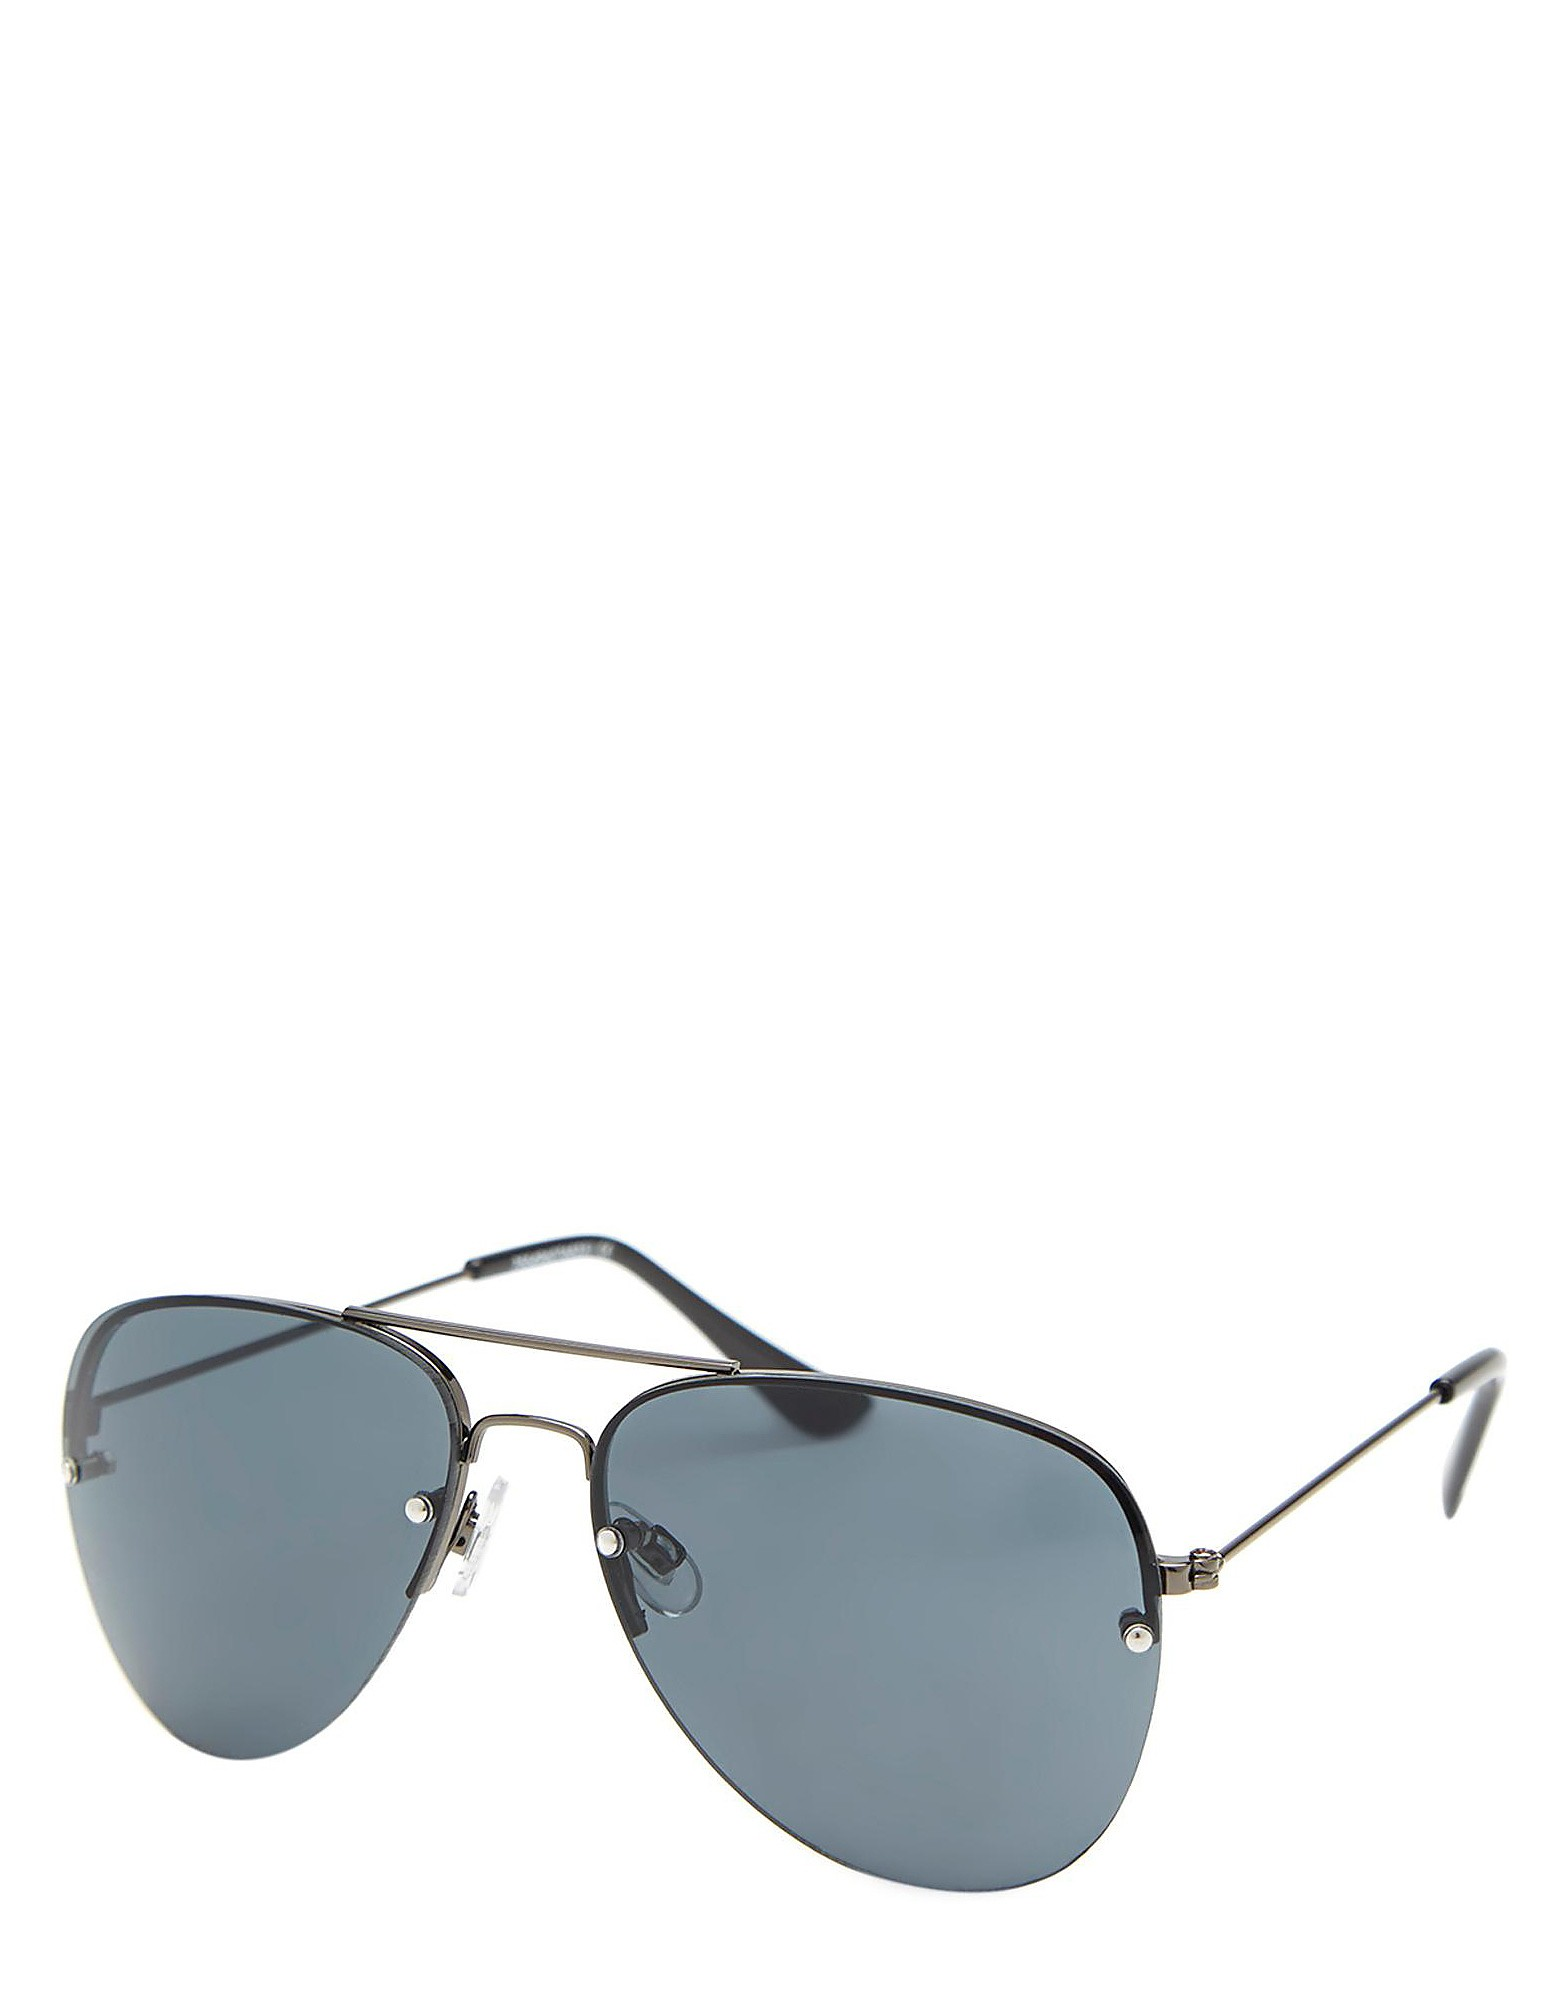 Brookhaven Knightsbridge Sunglasses